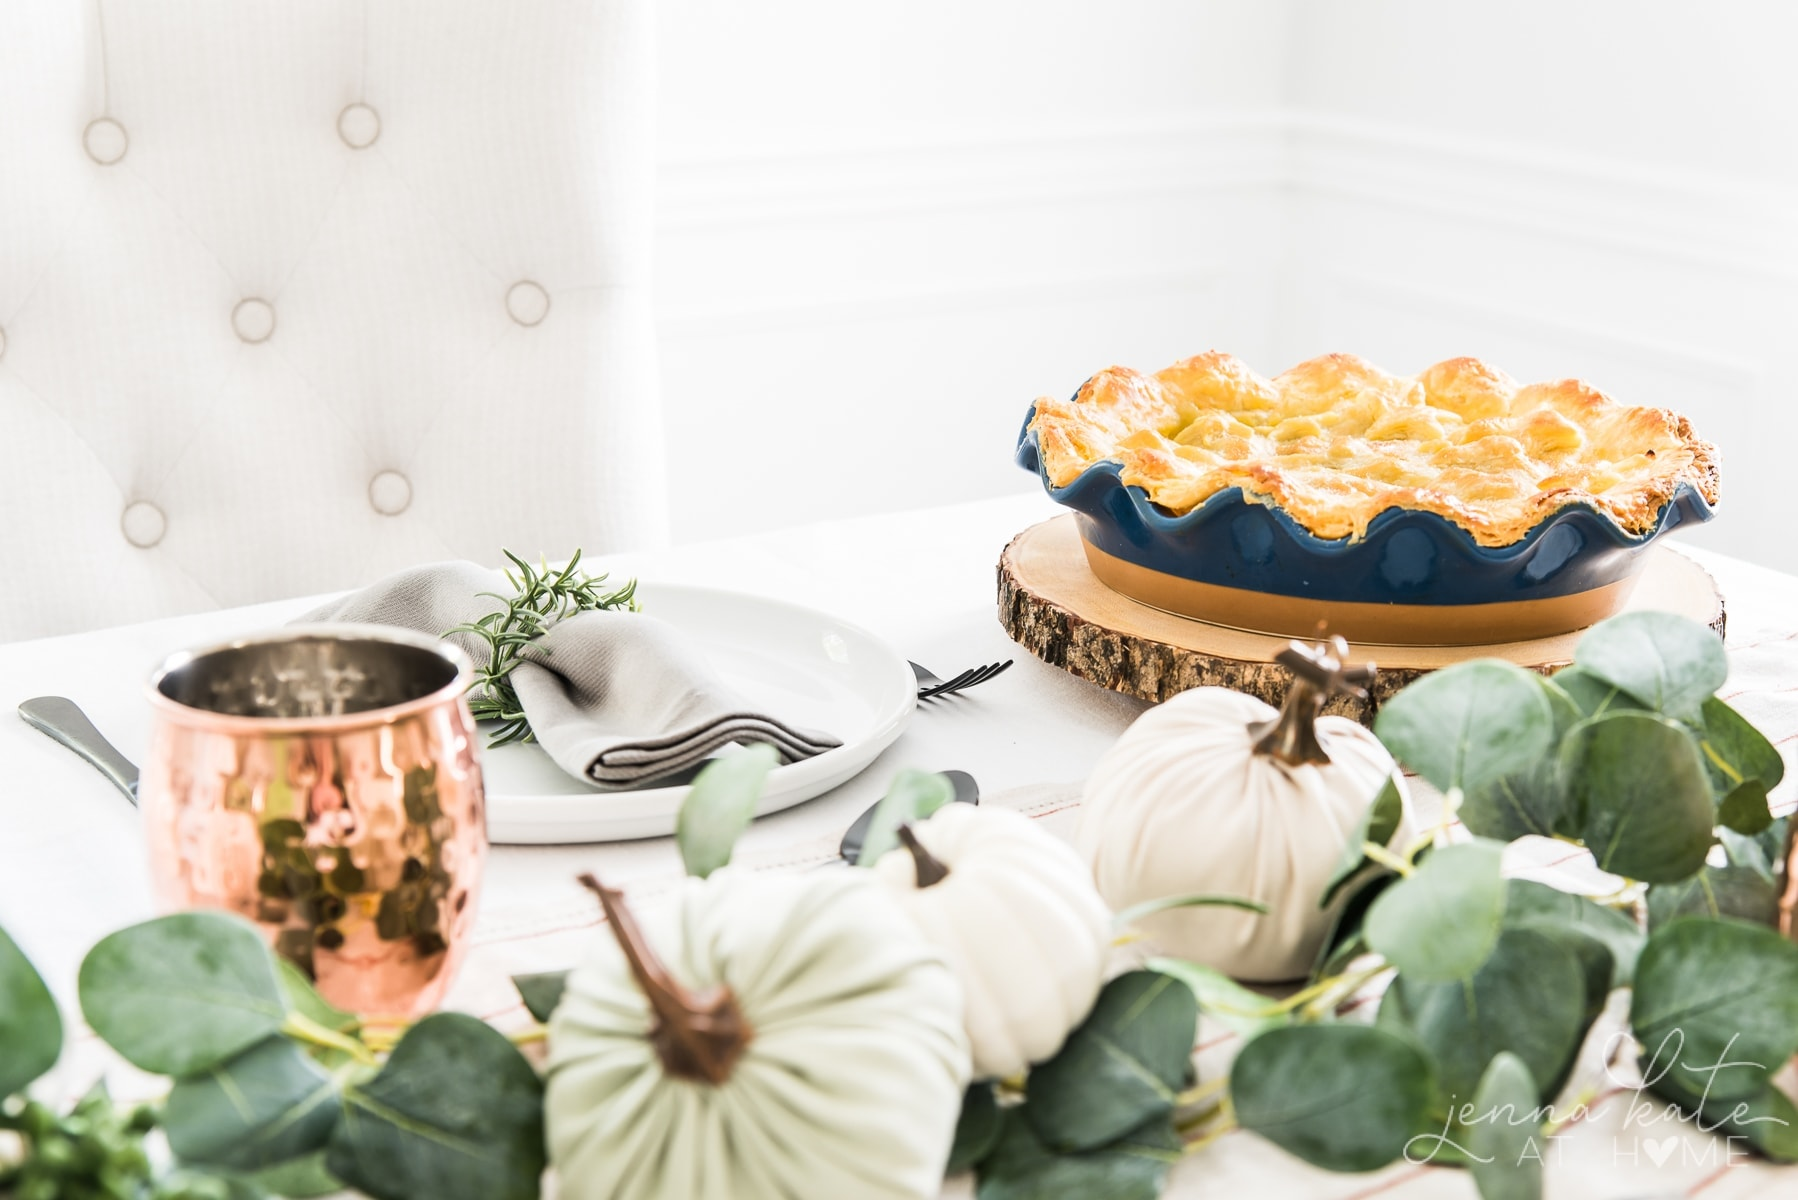 Elegant and contemporary fall tabletop decor